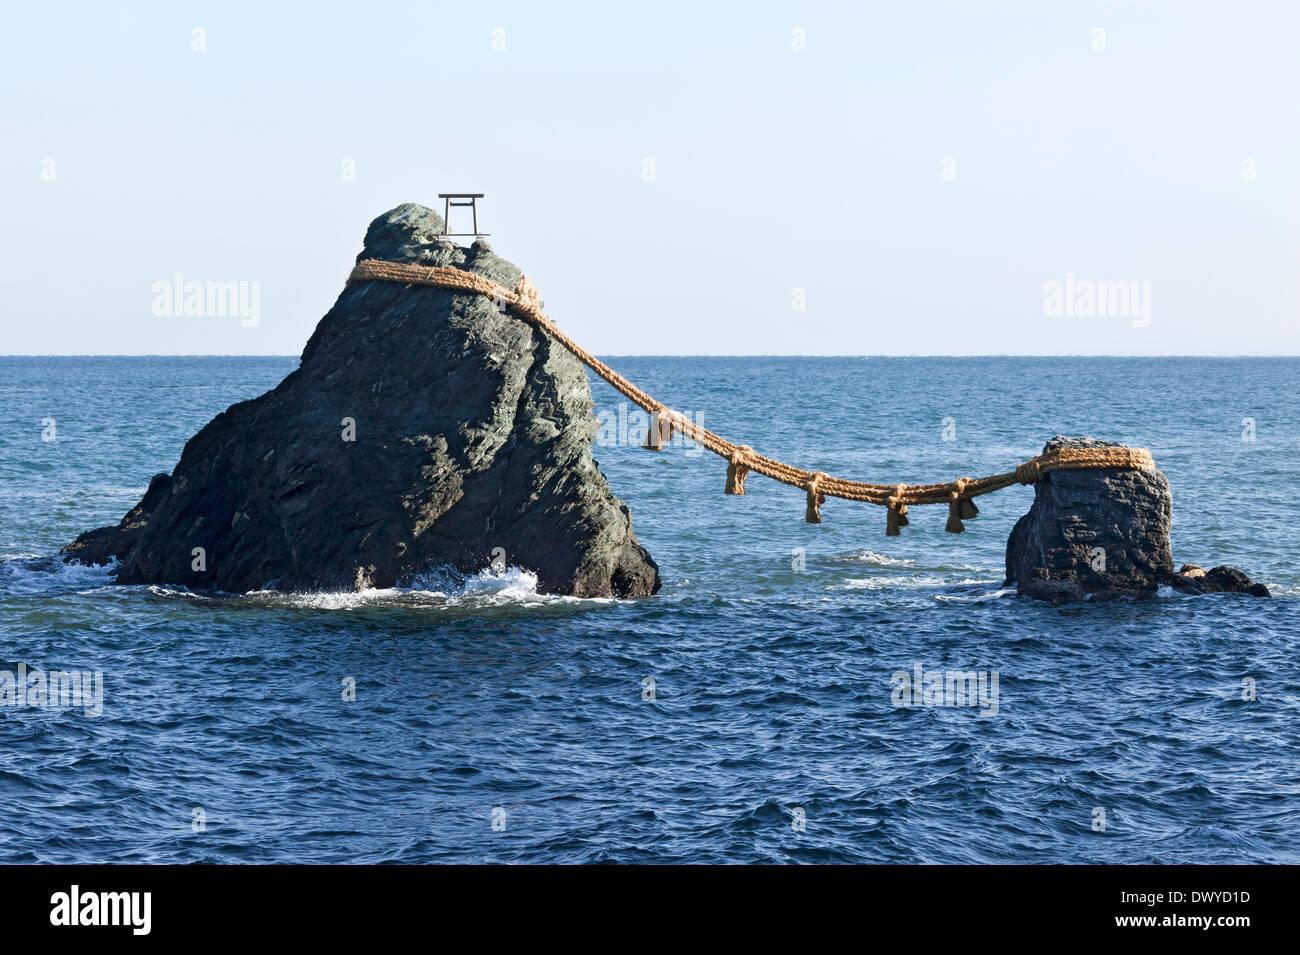 Meoto Iwa (Wedded rocks), Ise, Mie Prefecture, Japan - Stock Image